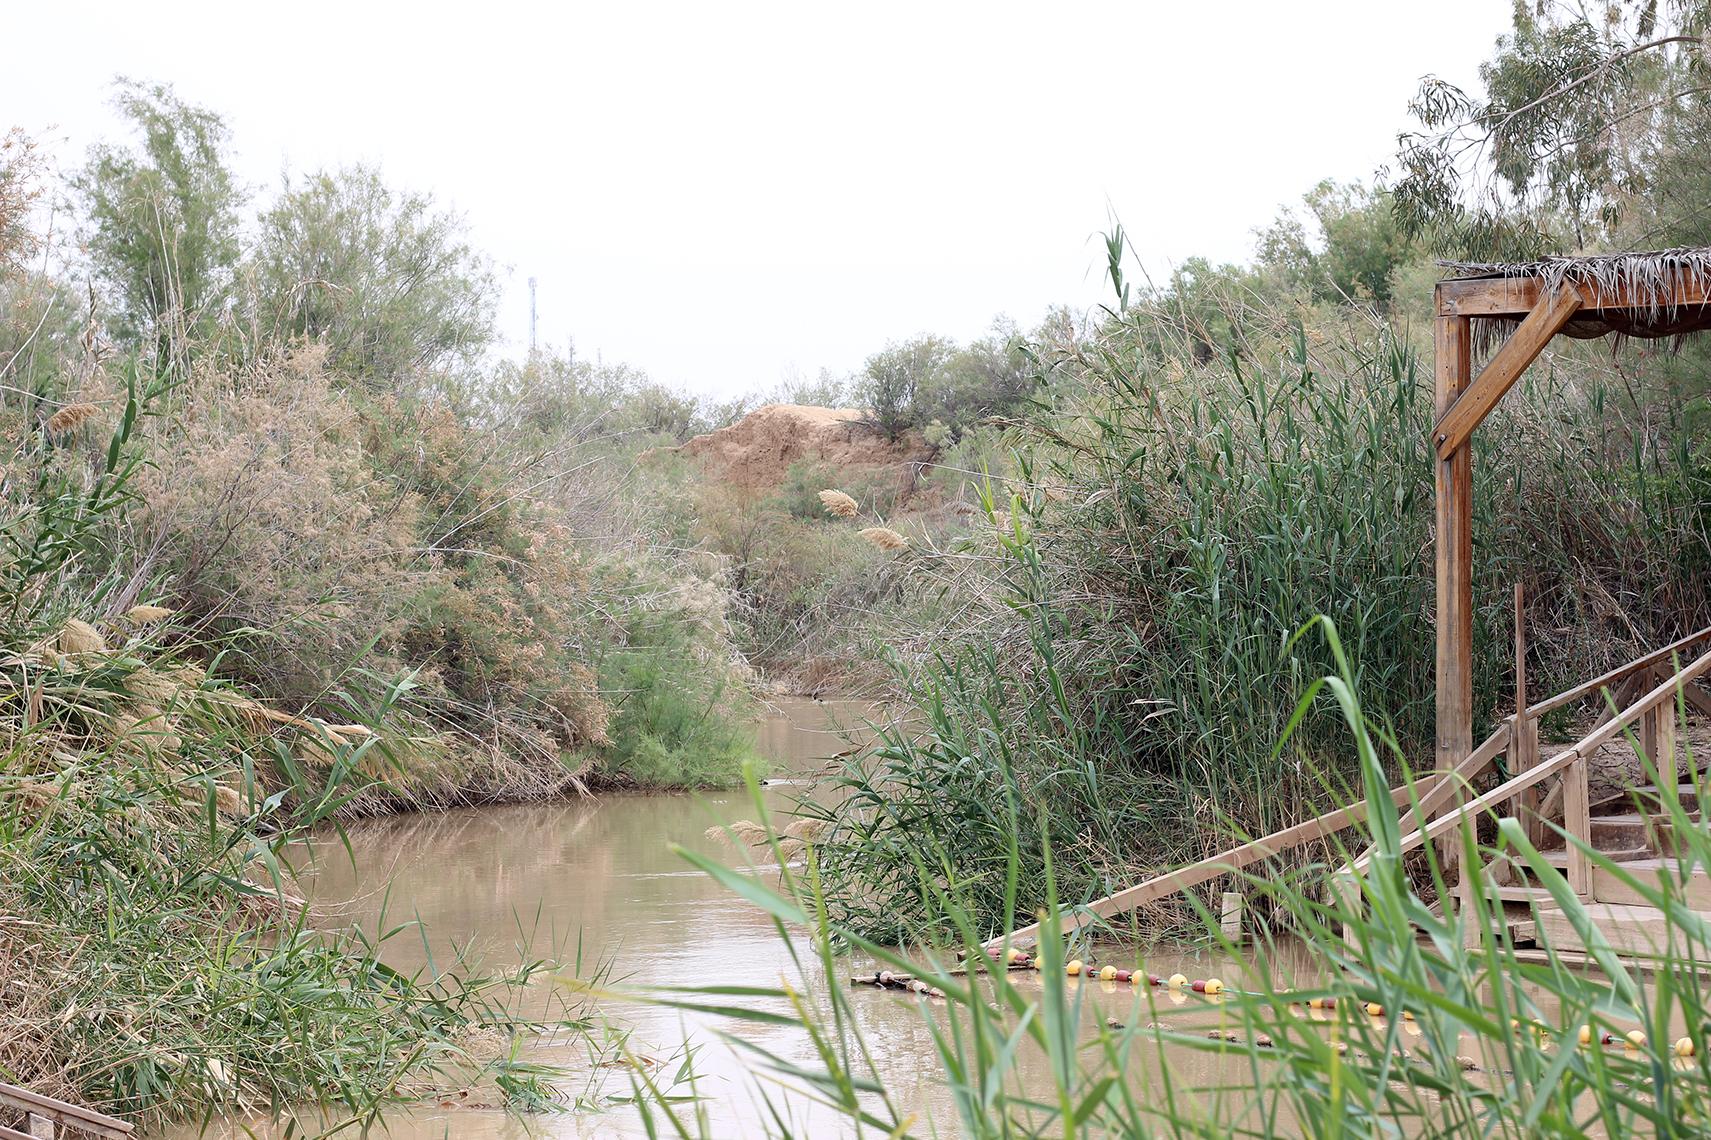 The mighty Jordan River.